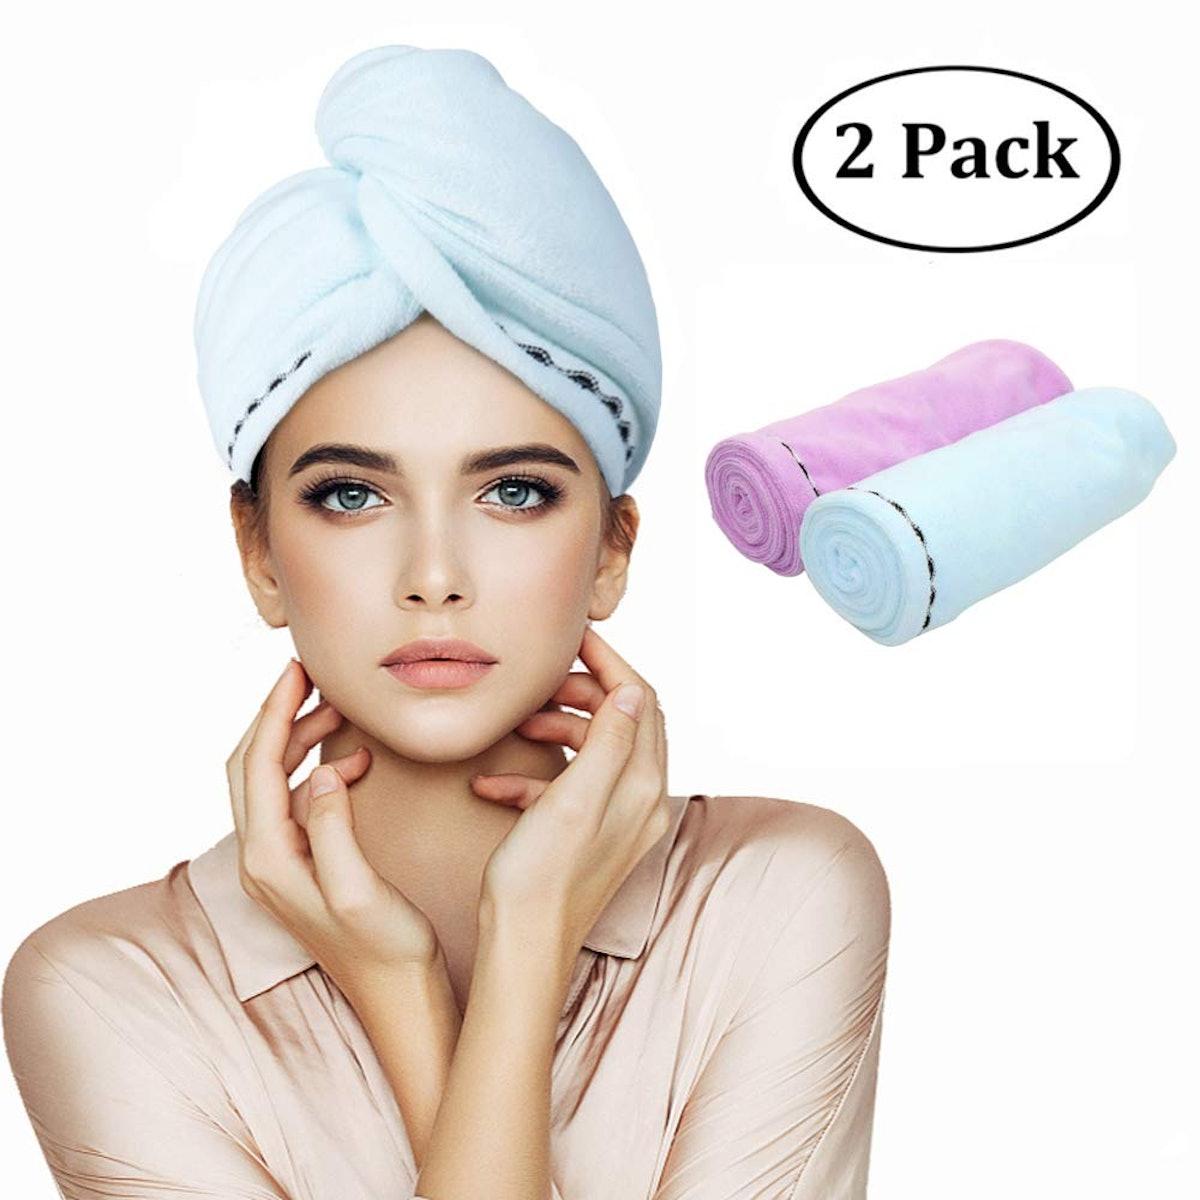 Orthland Microfiber Hair Towel Wraps (2-Pack)